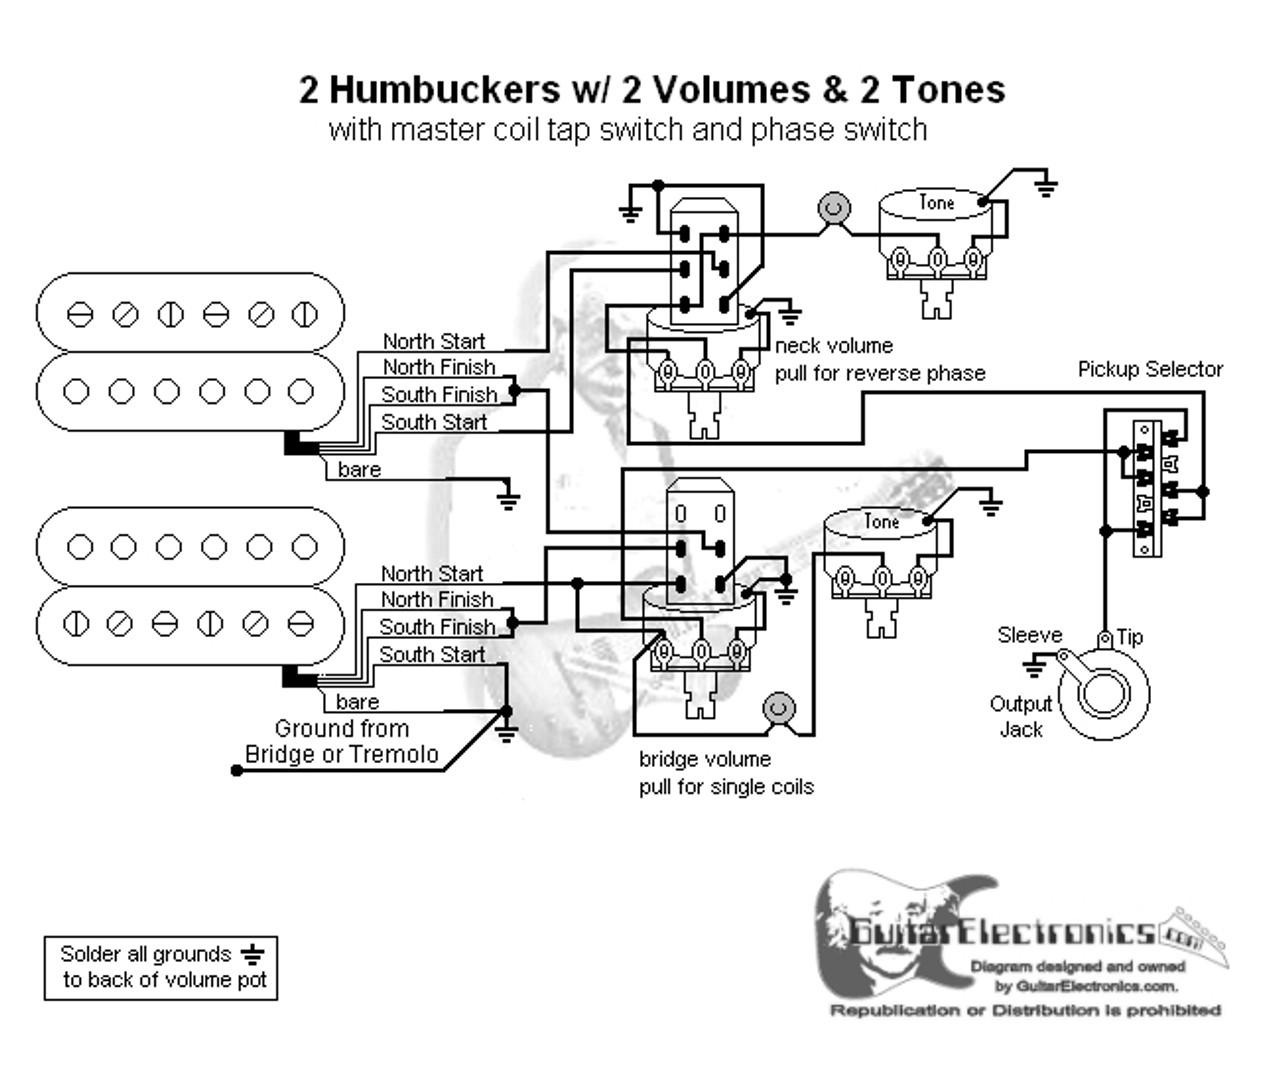 2 hbs 3 way lever 2 vol 2 tones coil tap u0026 reverse phasesound bridge [ 1280 x 1083 Pixel ]